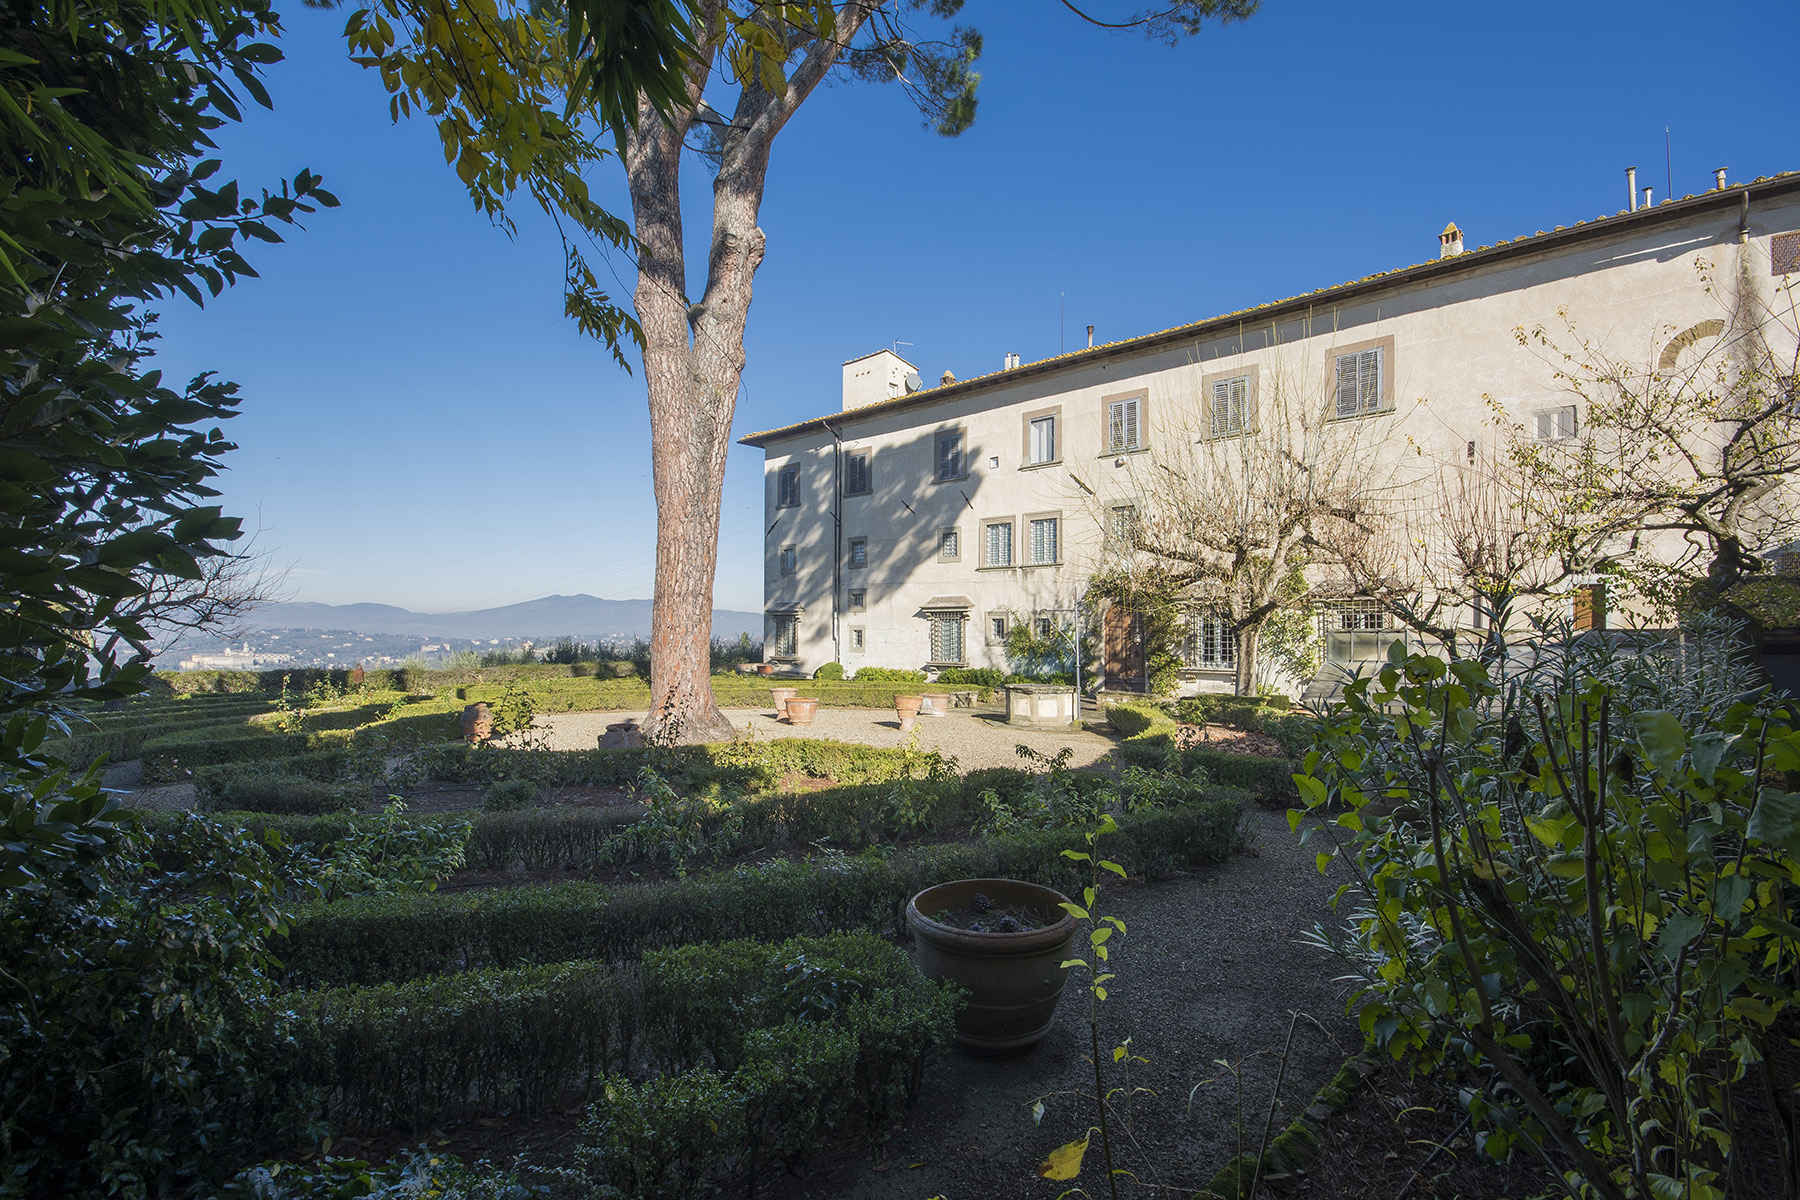 Villa in Affitto a Impruneta: 5 locali, 560 mq - Foto 2